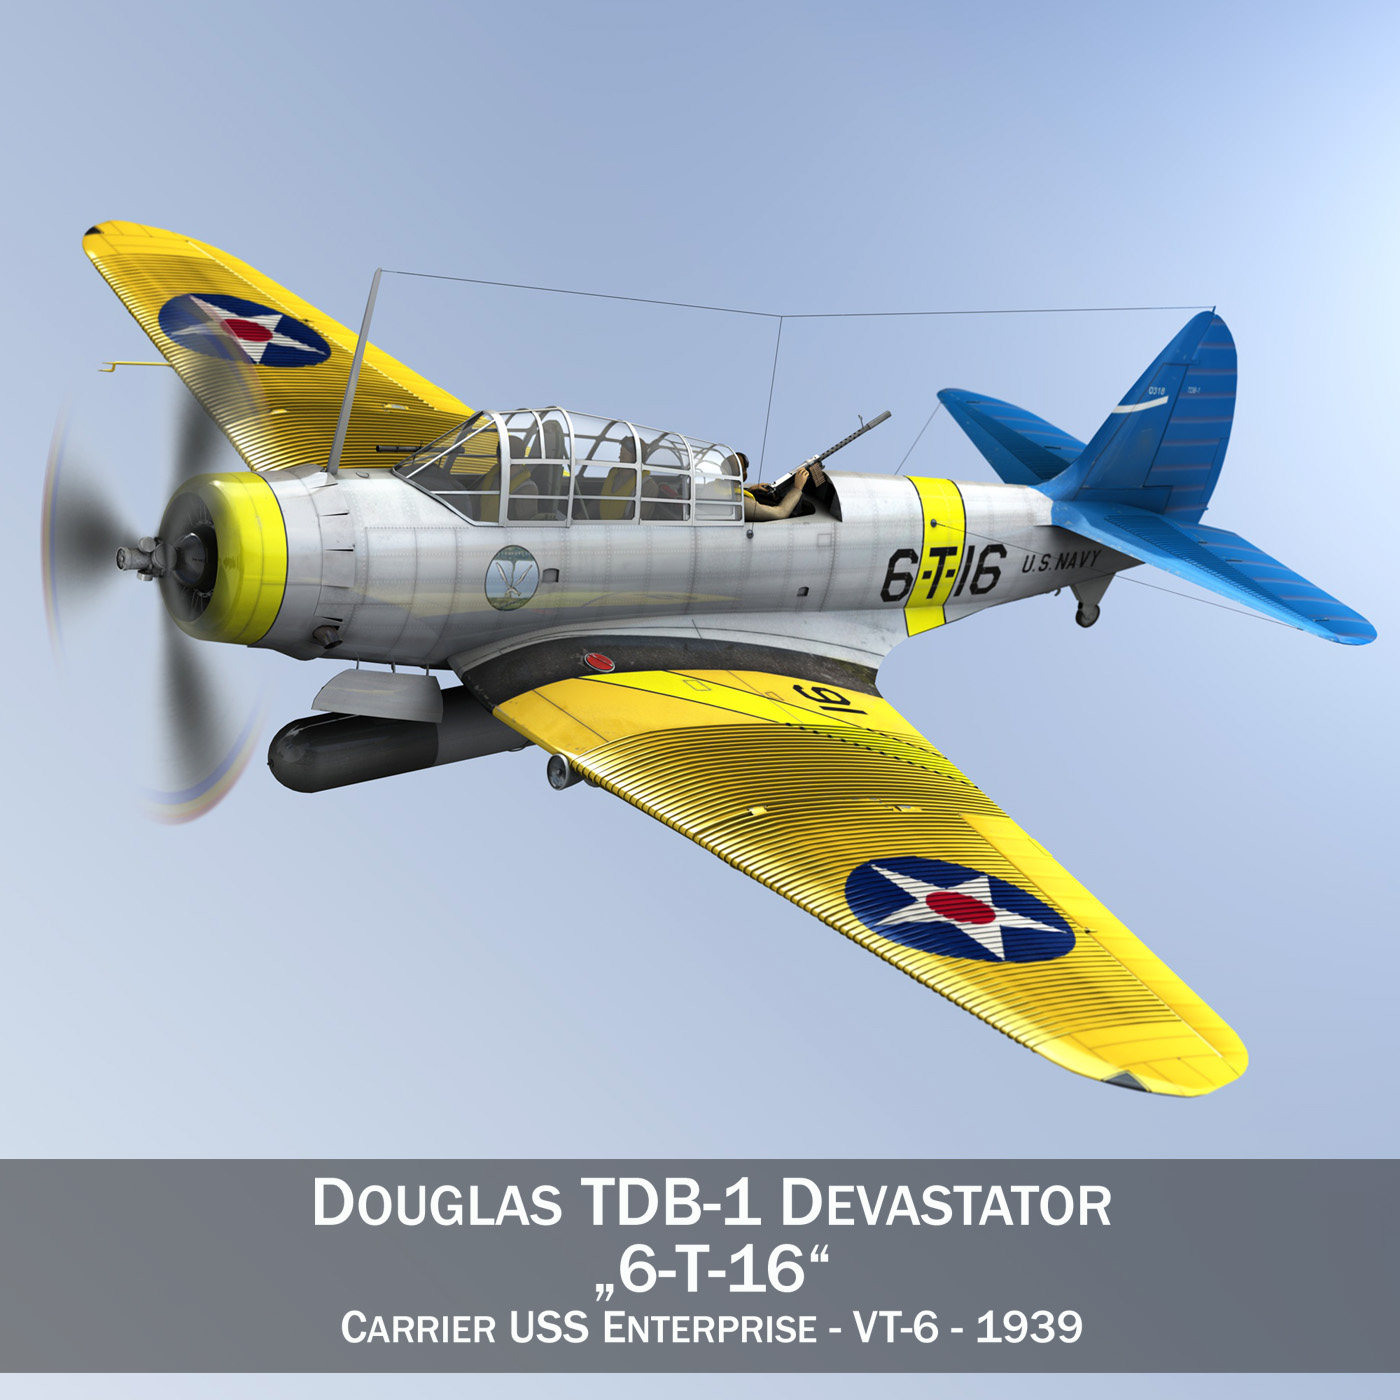 douglas tdb-1 devastator – 6t16 3d model 3ds fbx c4d lwo obj 270362